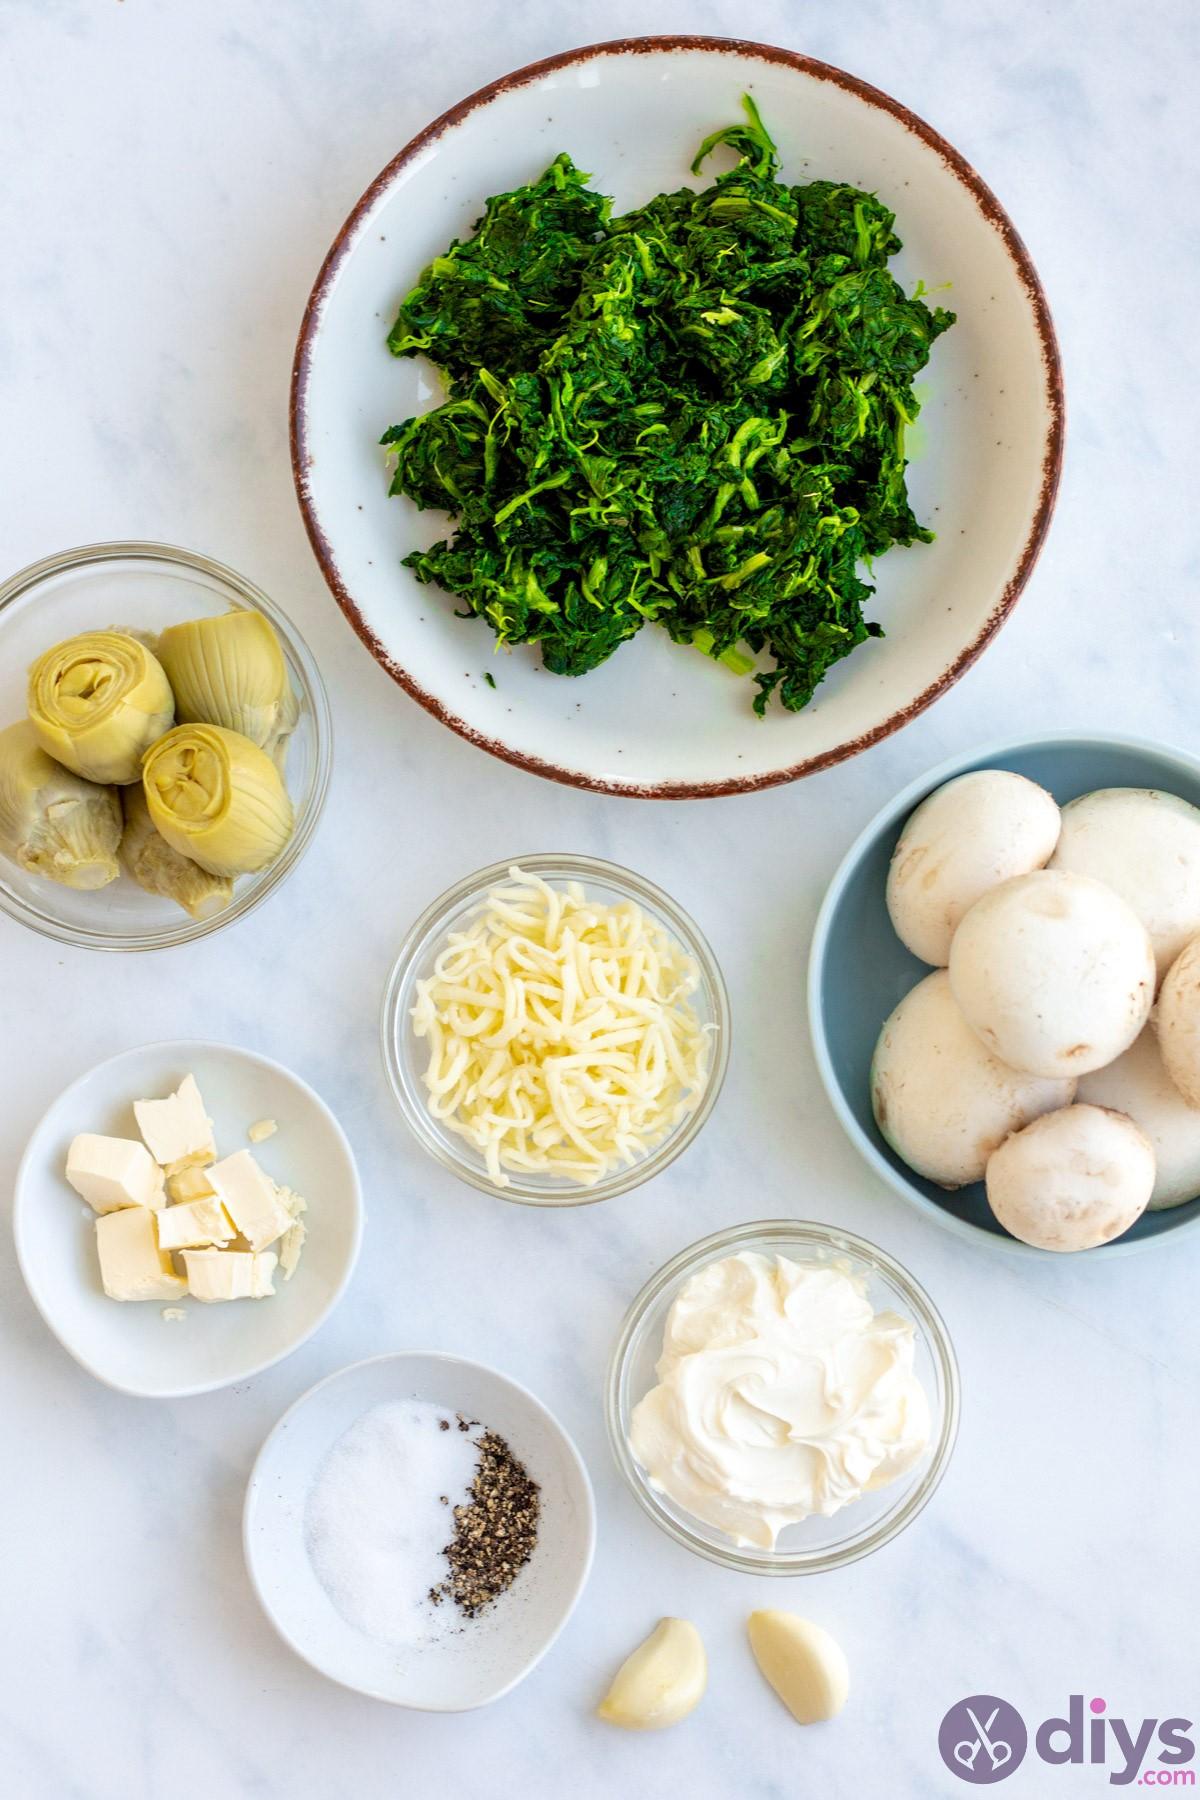 Keto spinach artichoke stuffed mushrooms